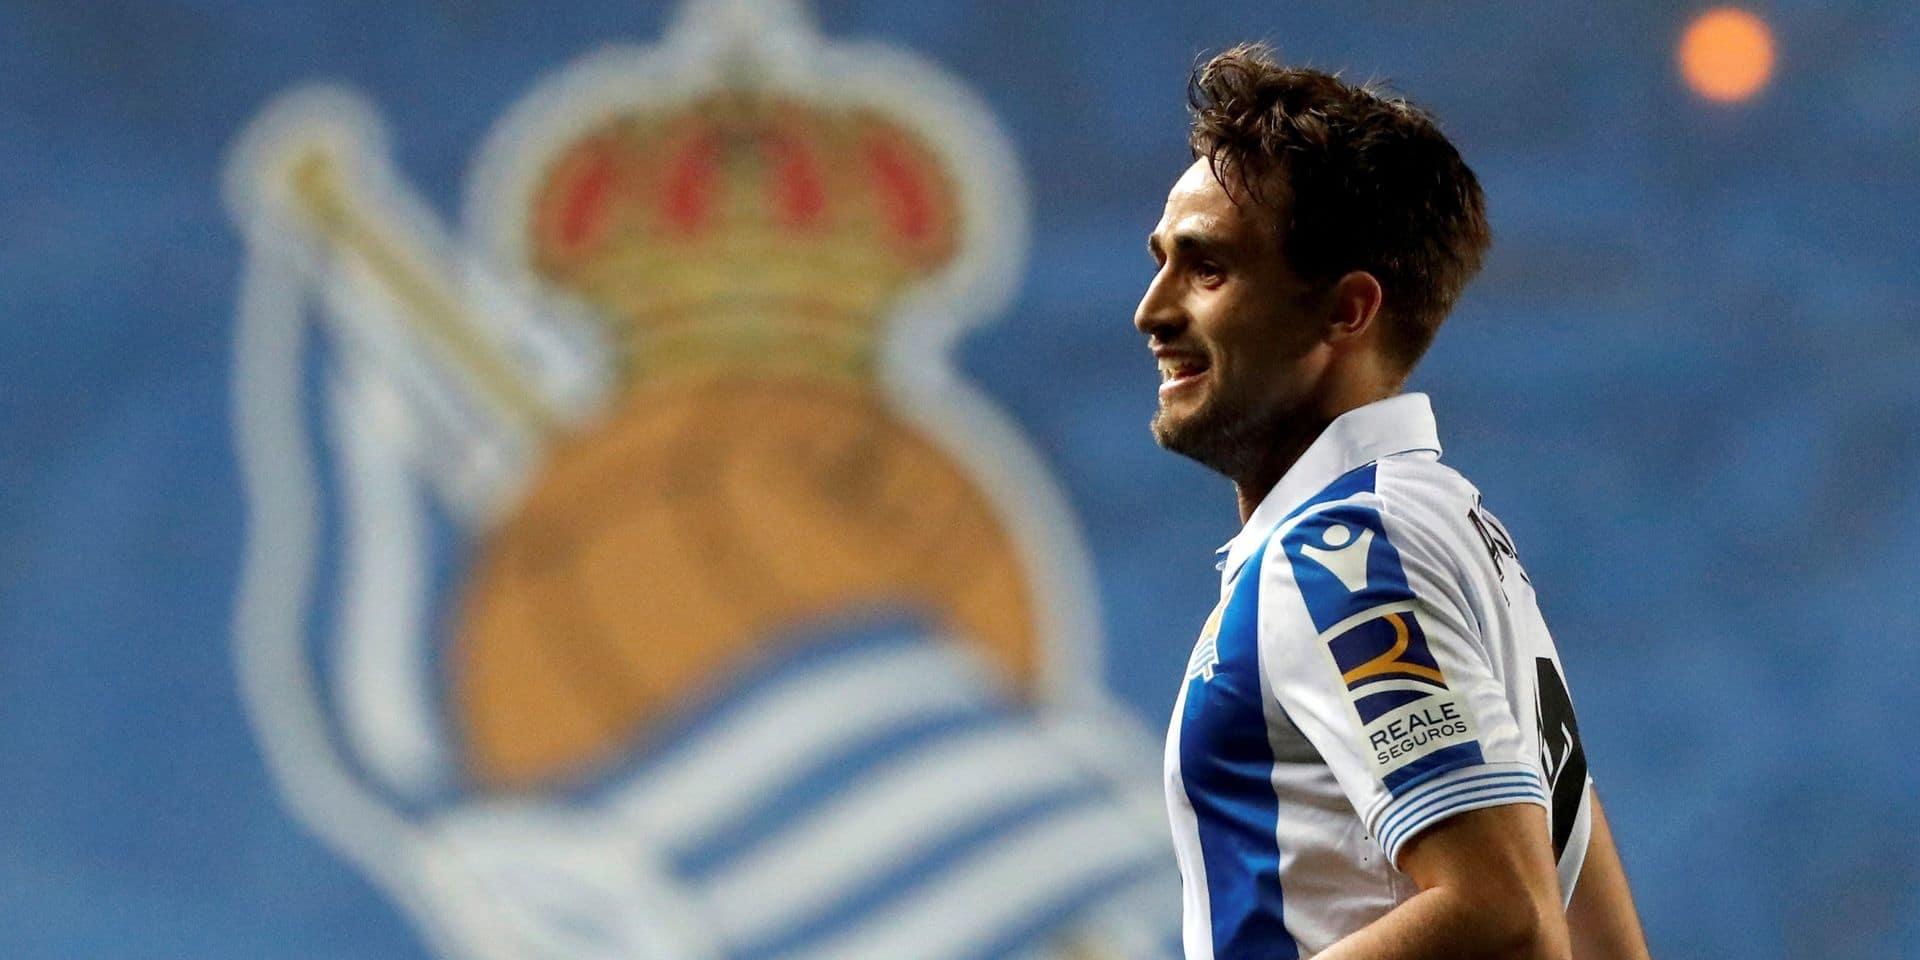 La Real Sociedad et Adnan Januzaj prennent la 4e place